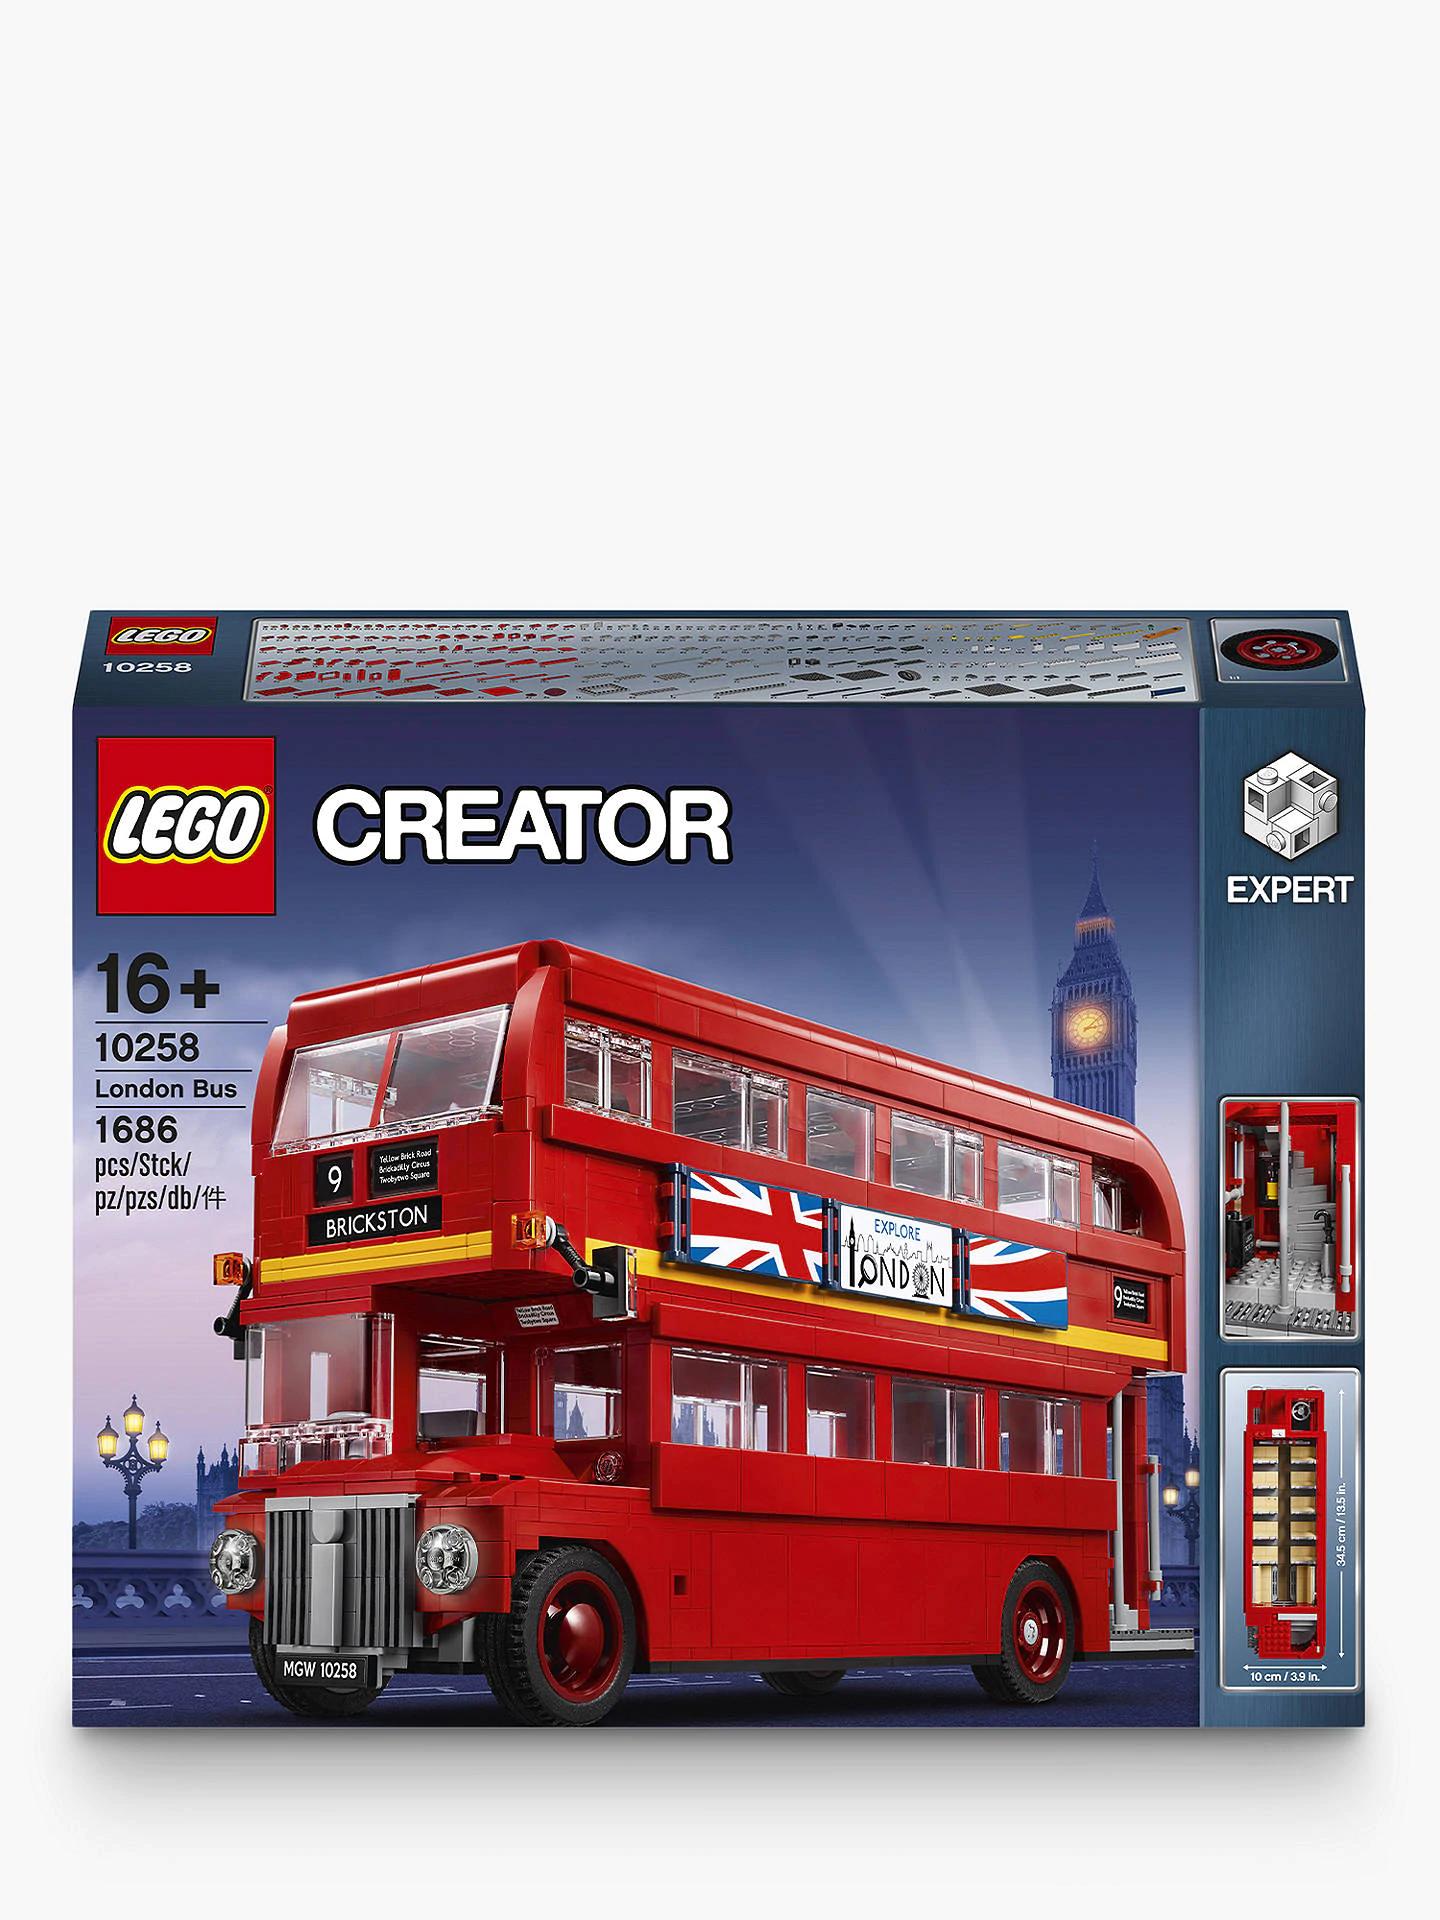 LEGO Creator 10258 London Bus £94.95 Price Match / Click & Collect @ John Lewis & partners